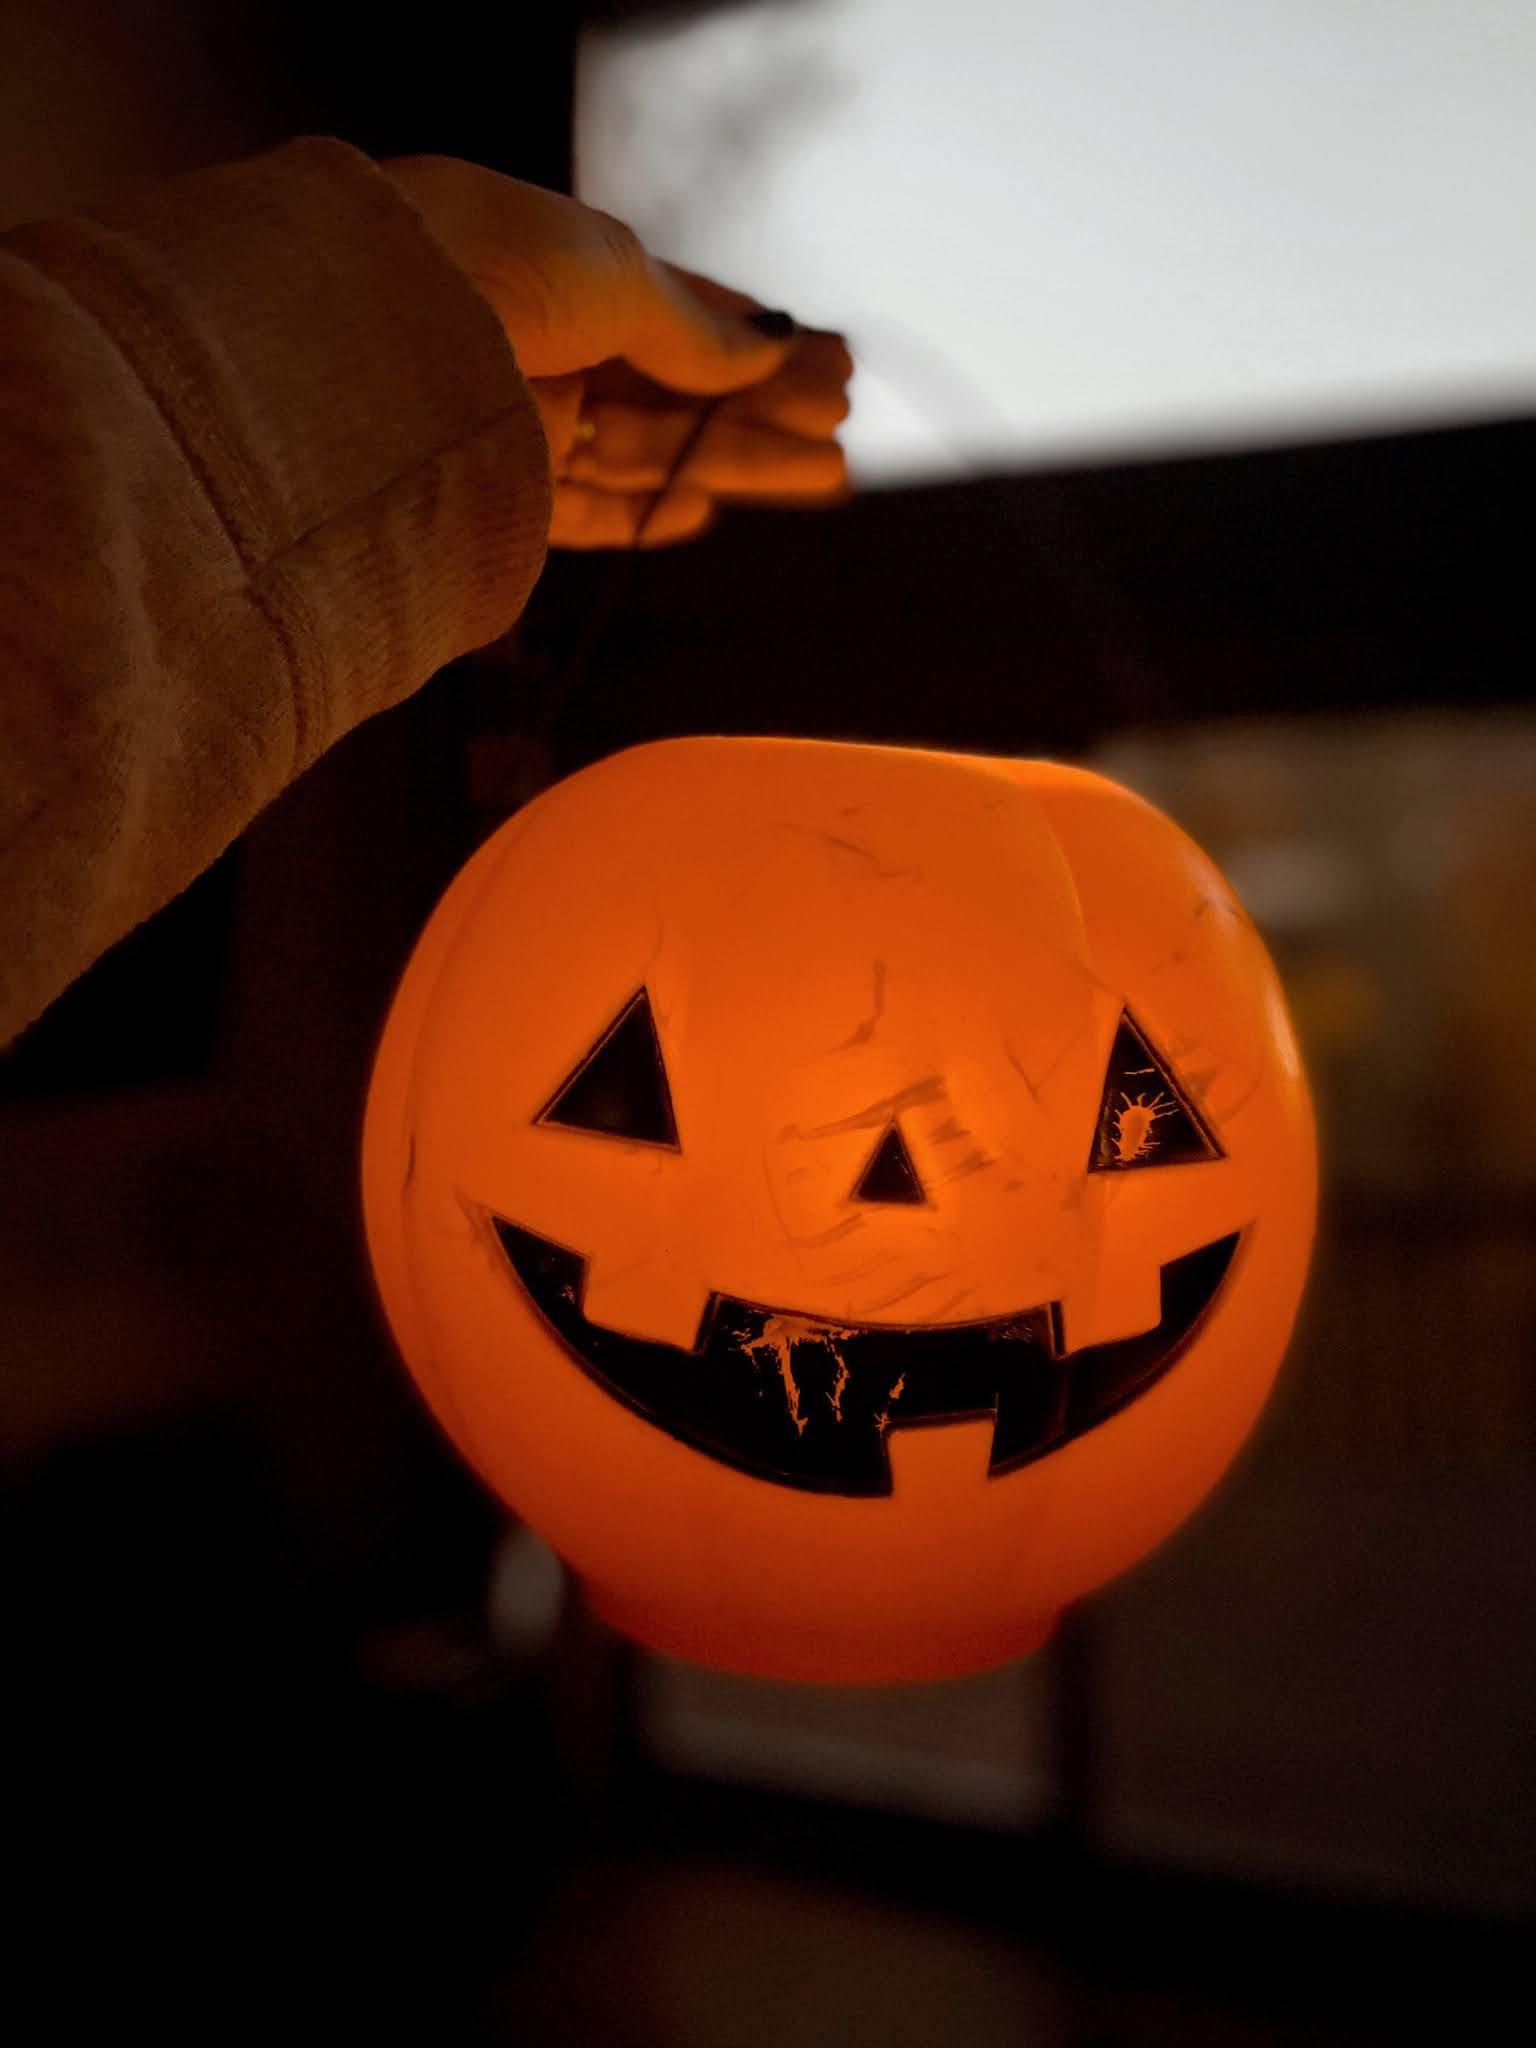 Halloween Trick Or Treat Pumpkin | biblio-style.com